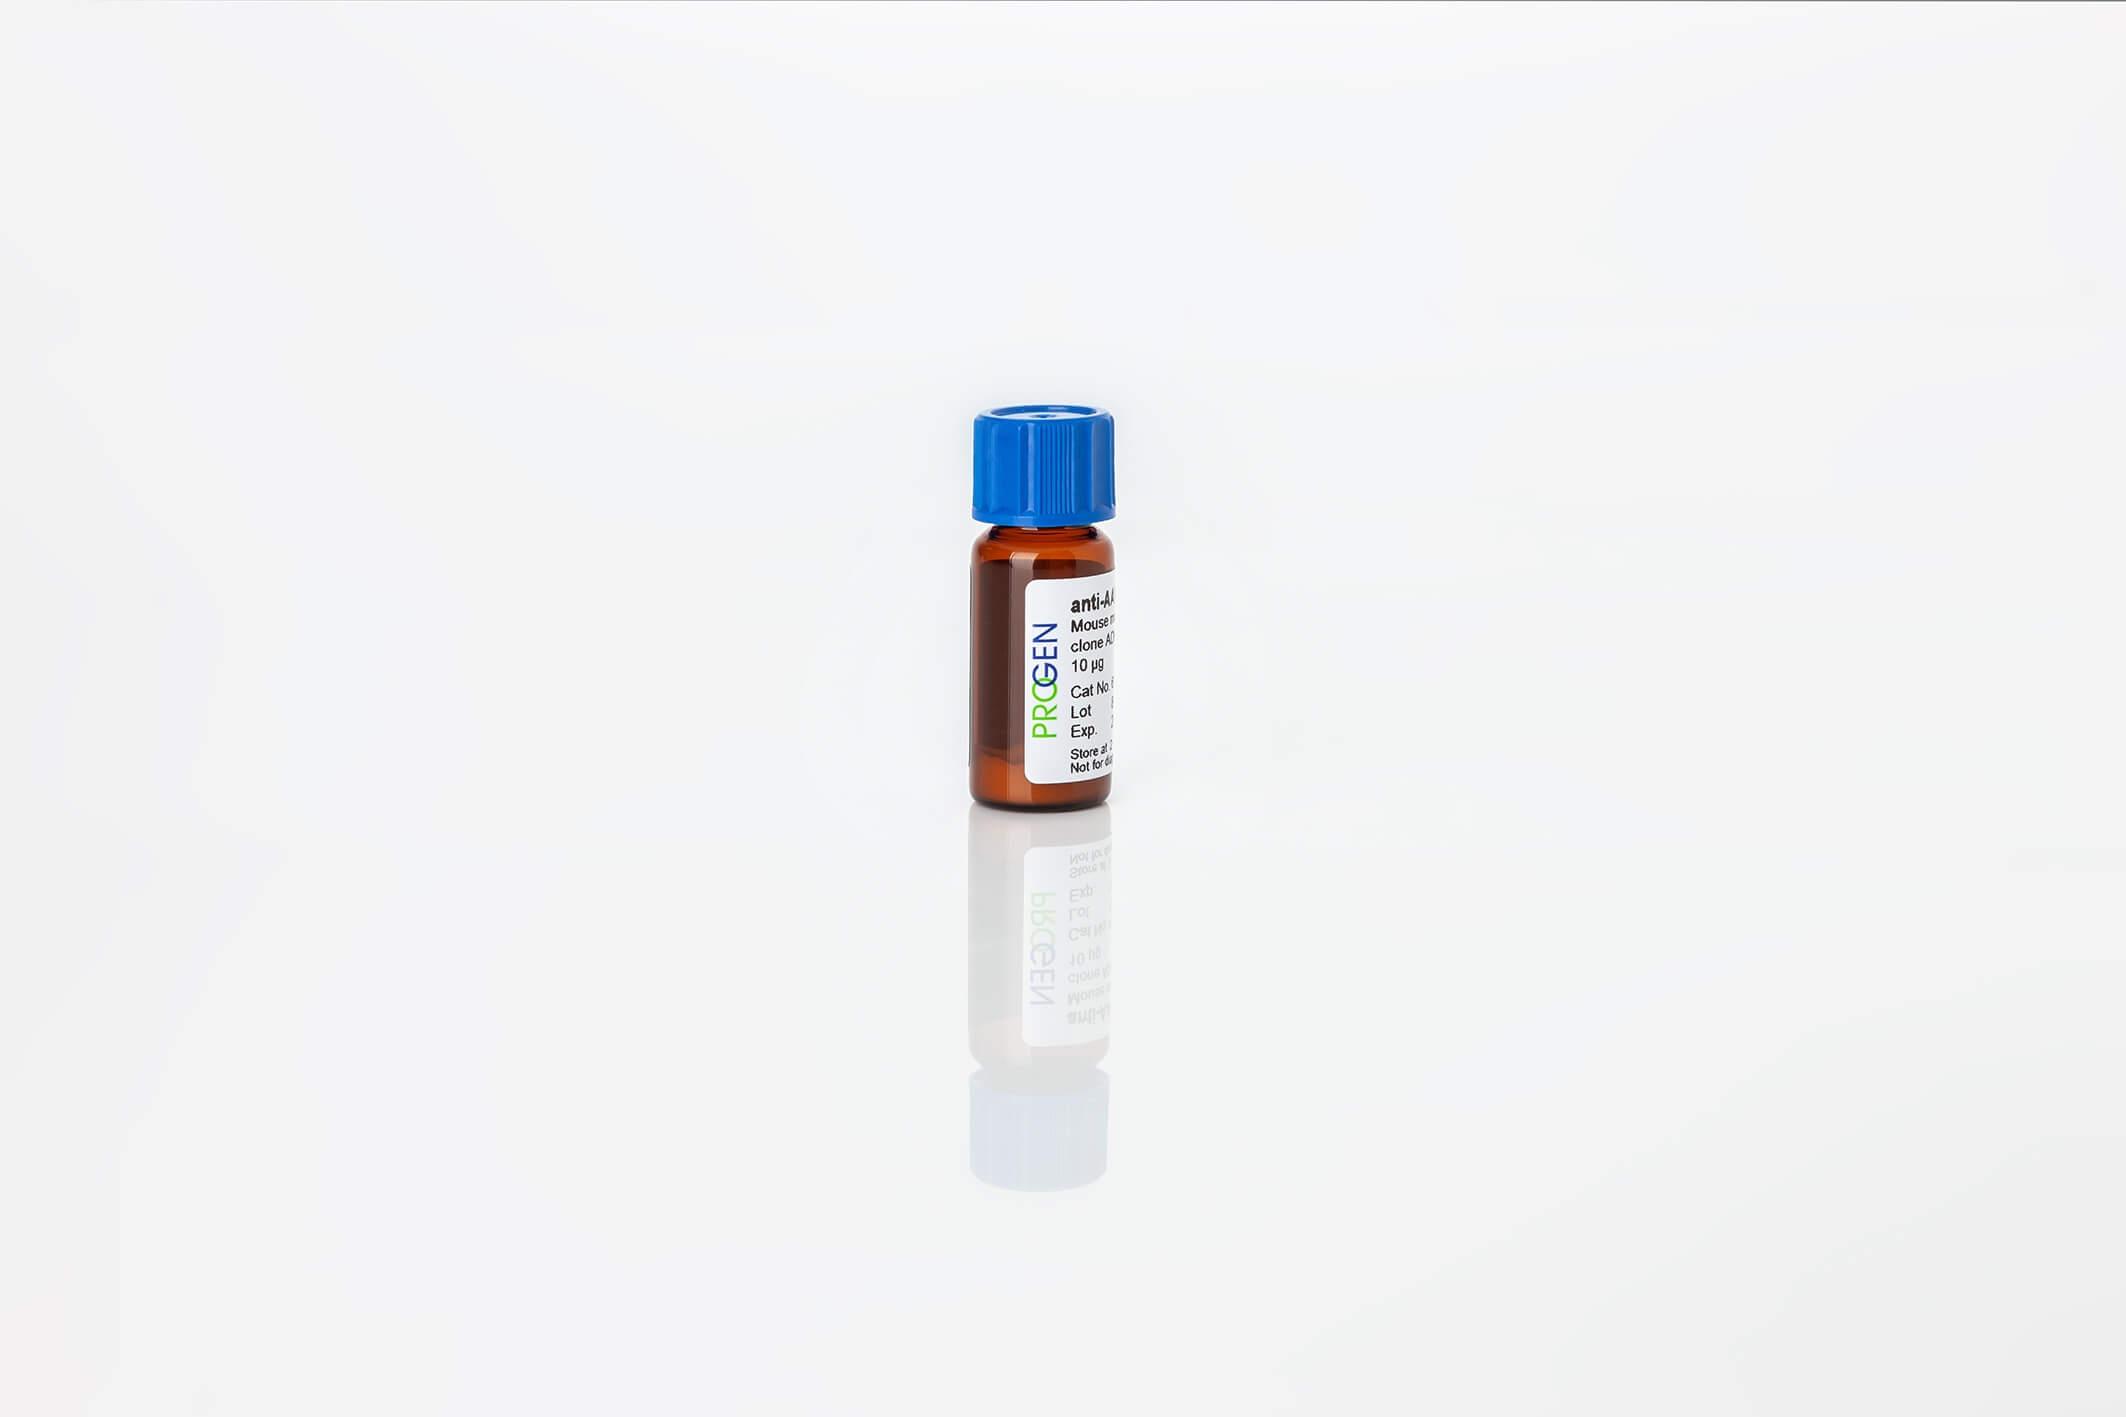 anti-Calcitonin Gene Related Peptide (human) guinea pig polyclonal, serum